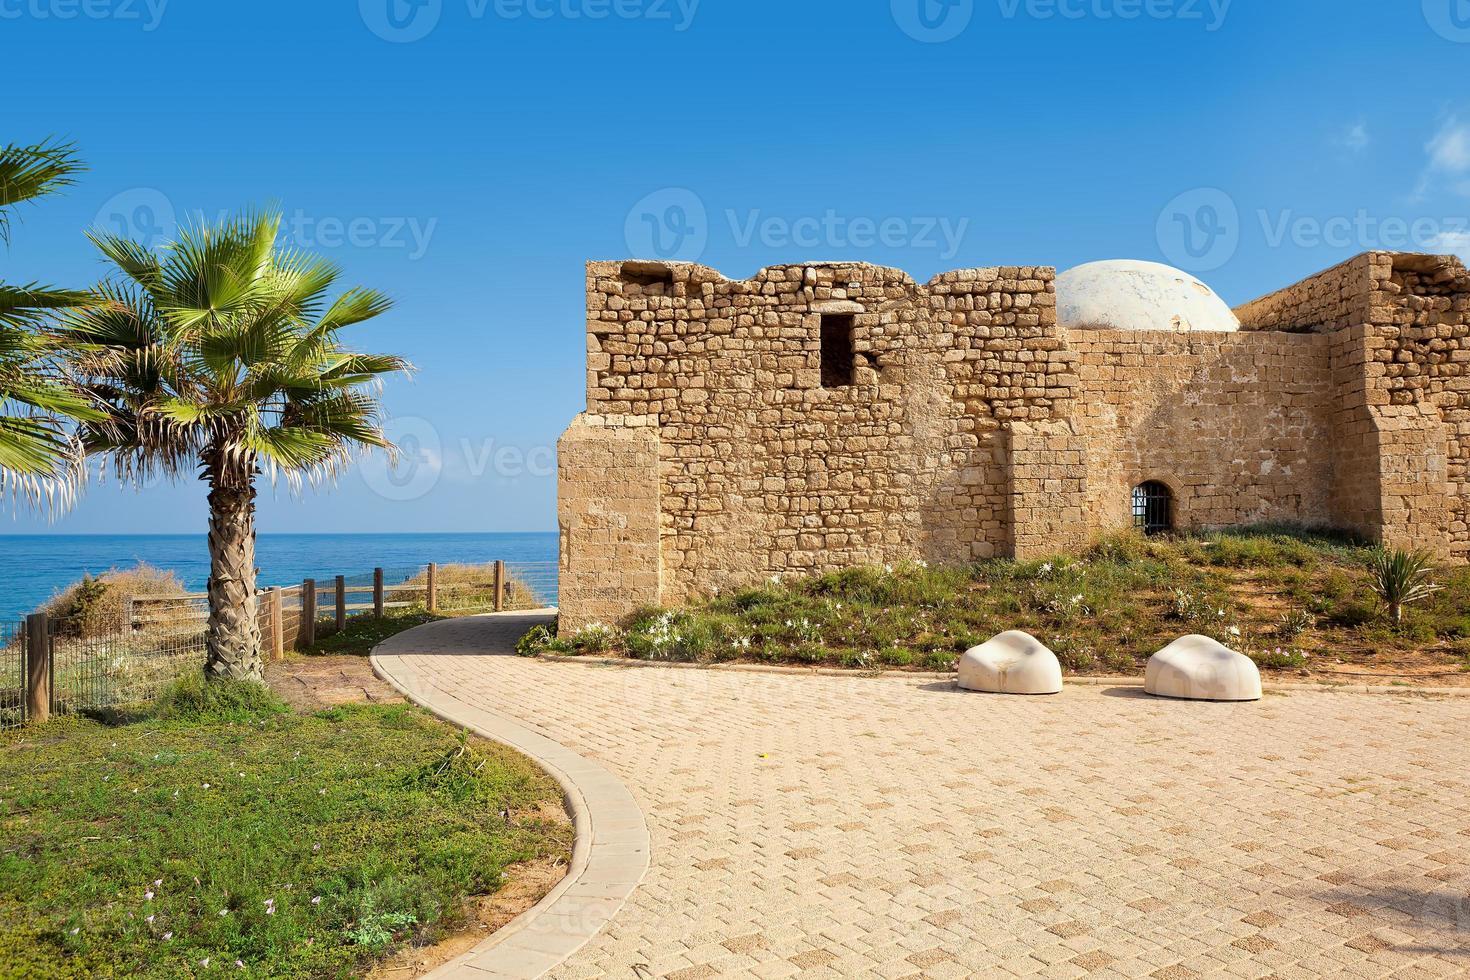 passeio e tumba antiga em ashqelon, israel. foto